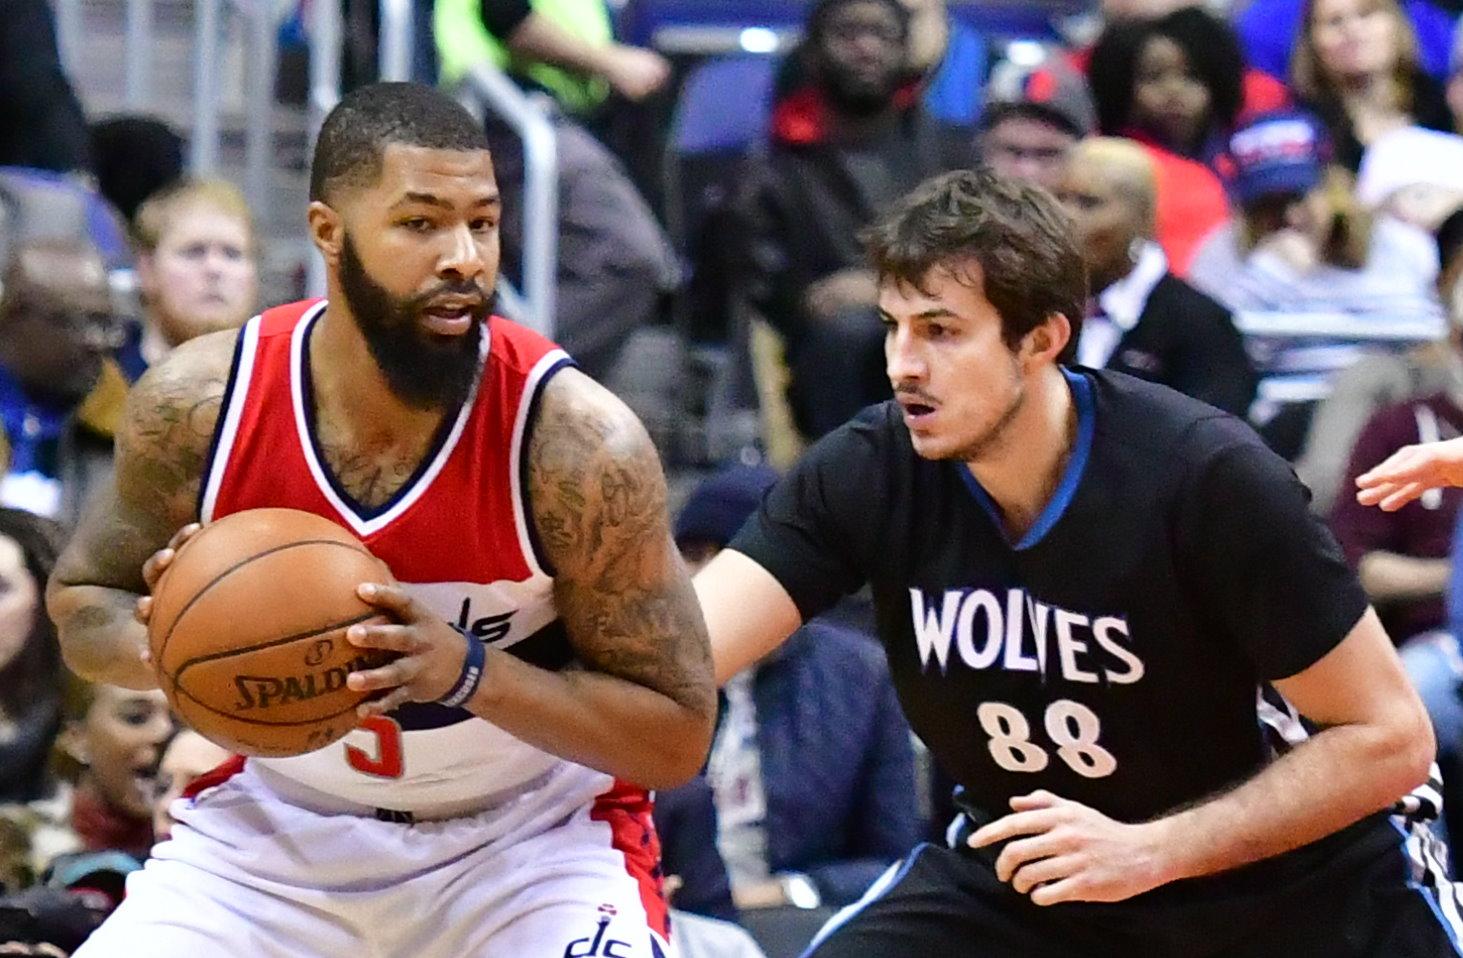 Washington Wizards forward Markieff Morris posts up against Minnesota Timberwolves forward Nemanja Bjelica in the first quarter of the Wizards' 112-105 victory at Verizon Center in northwest D.C. on Jan. 6. (John De Freitas/The Washington Informer)